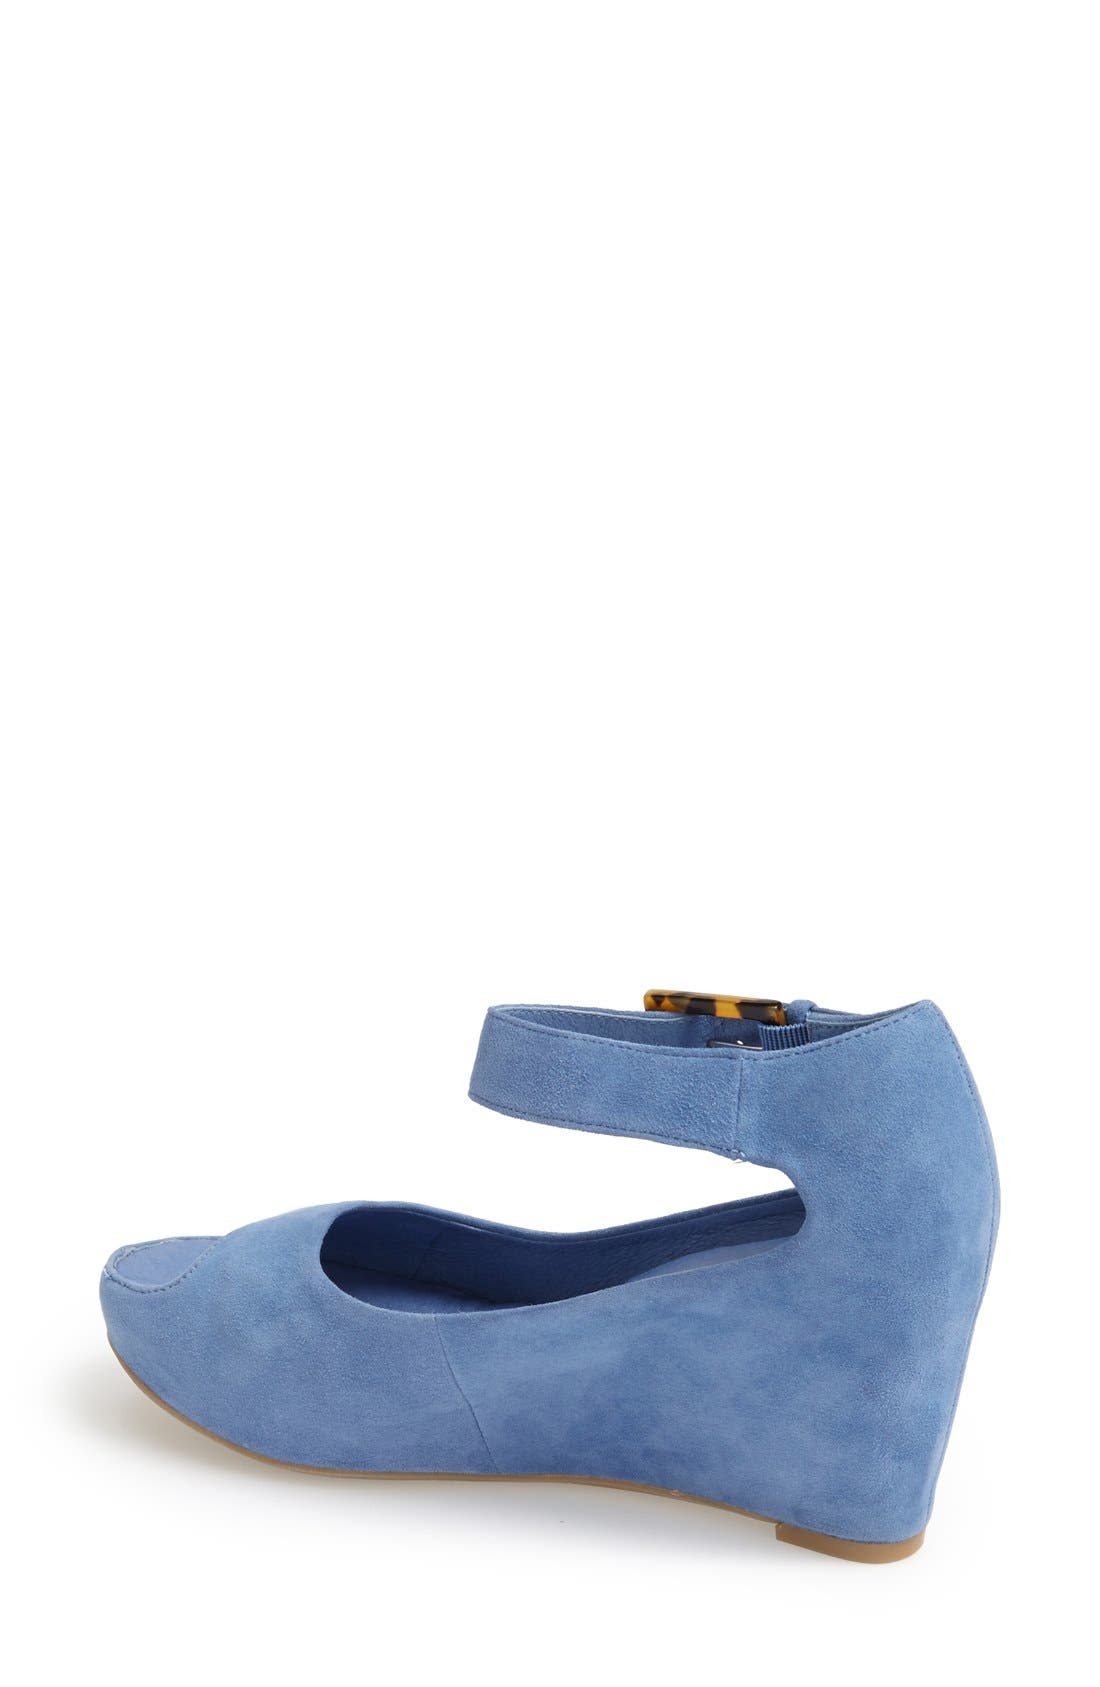 'Tricia' Ankle Strap Sandal,                             Alternate thumbnail 58, color,